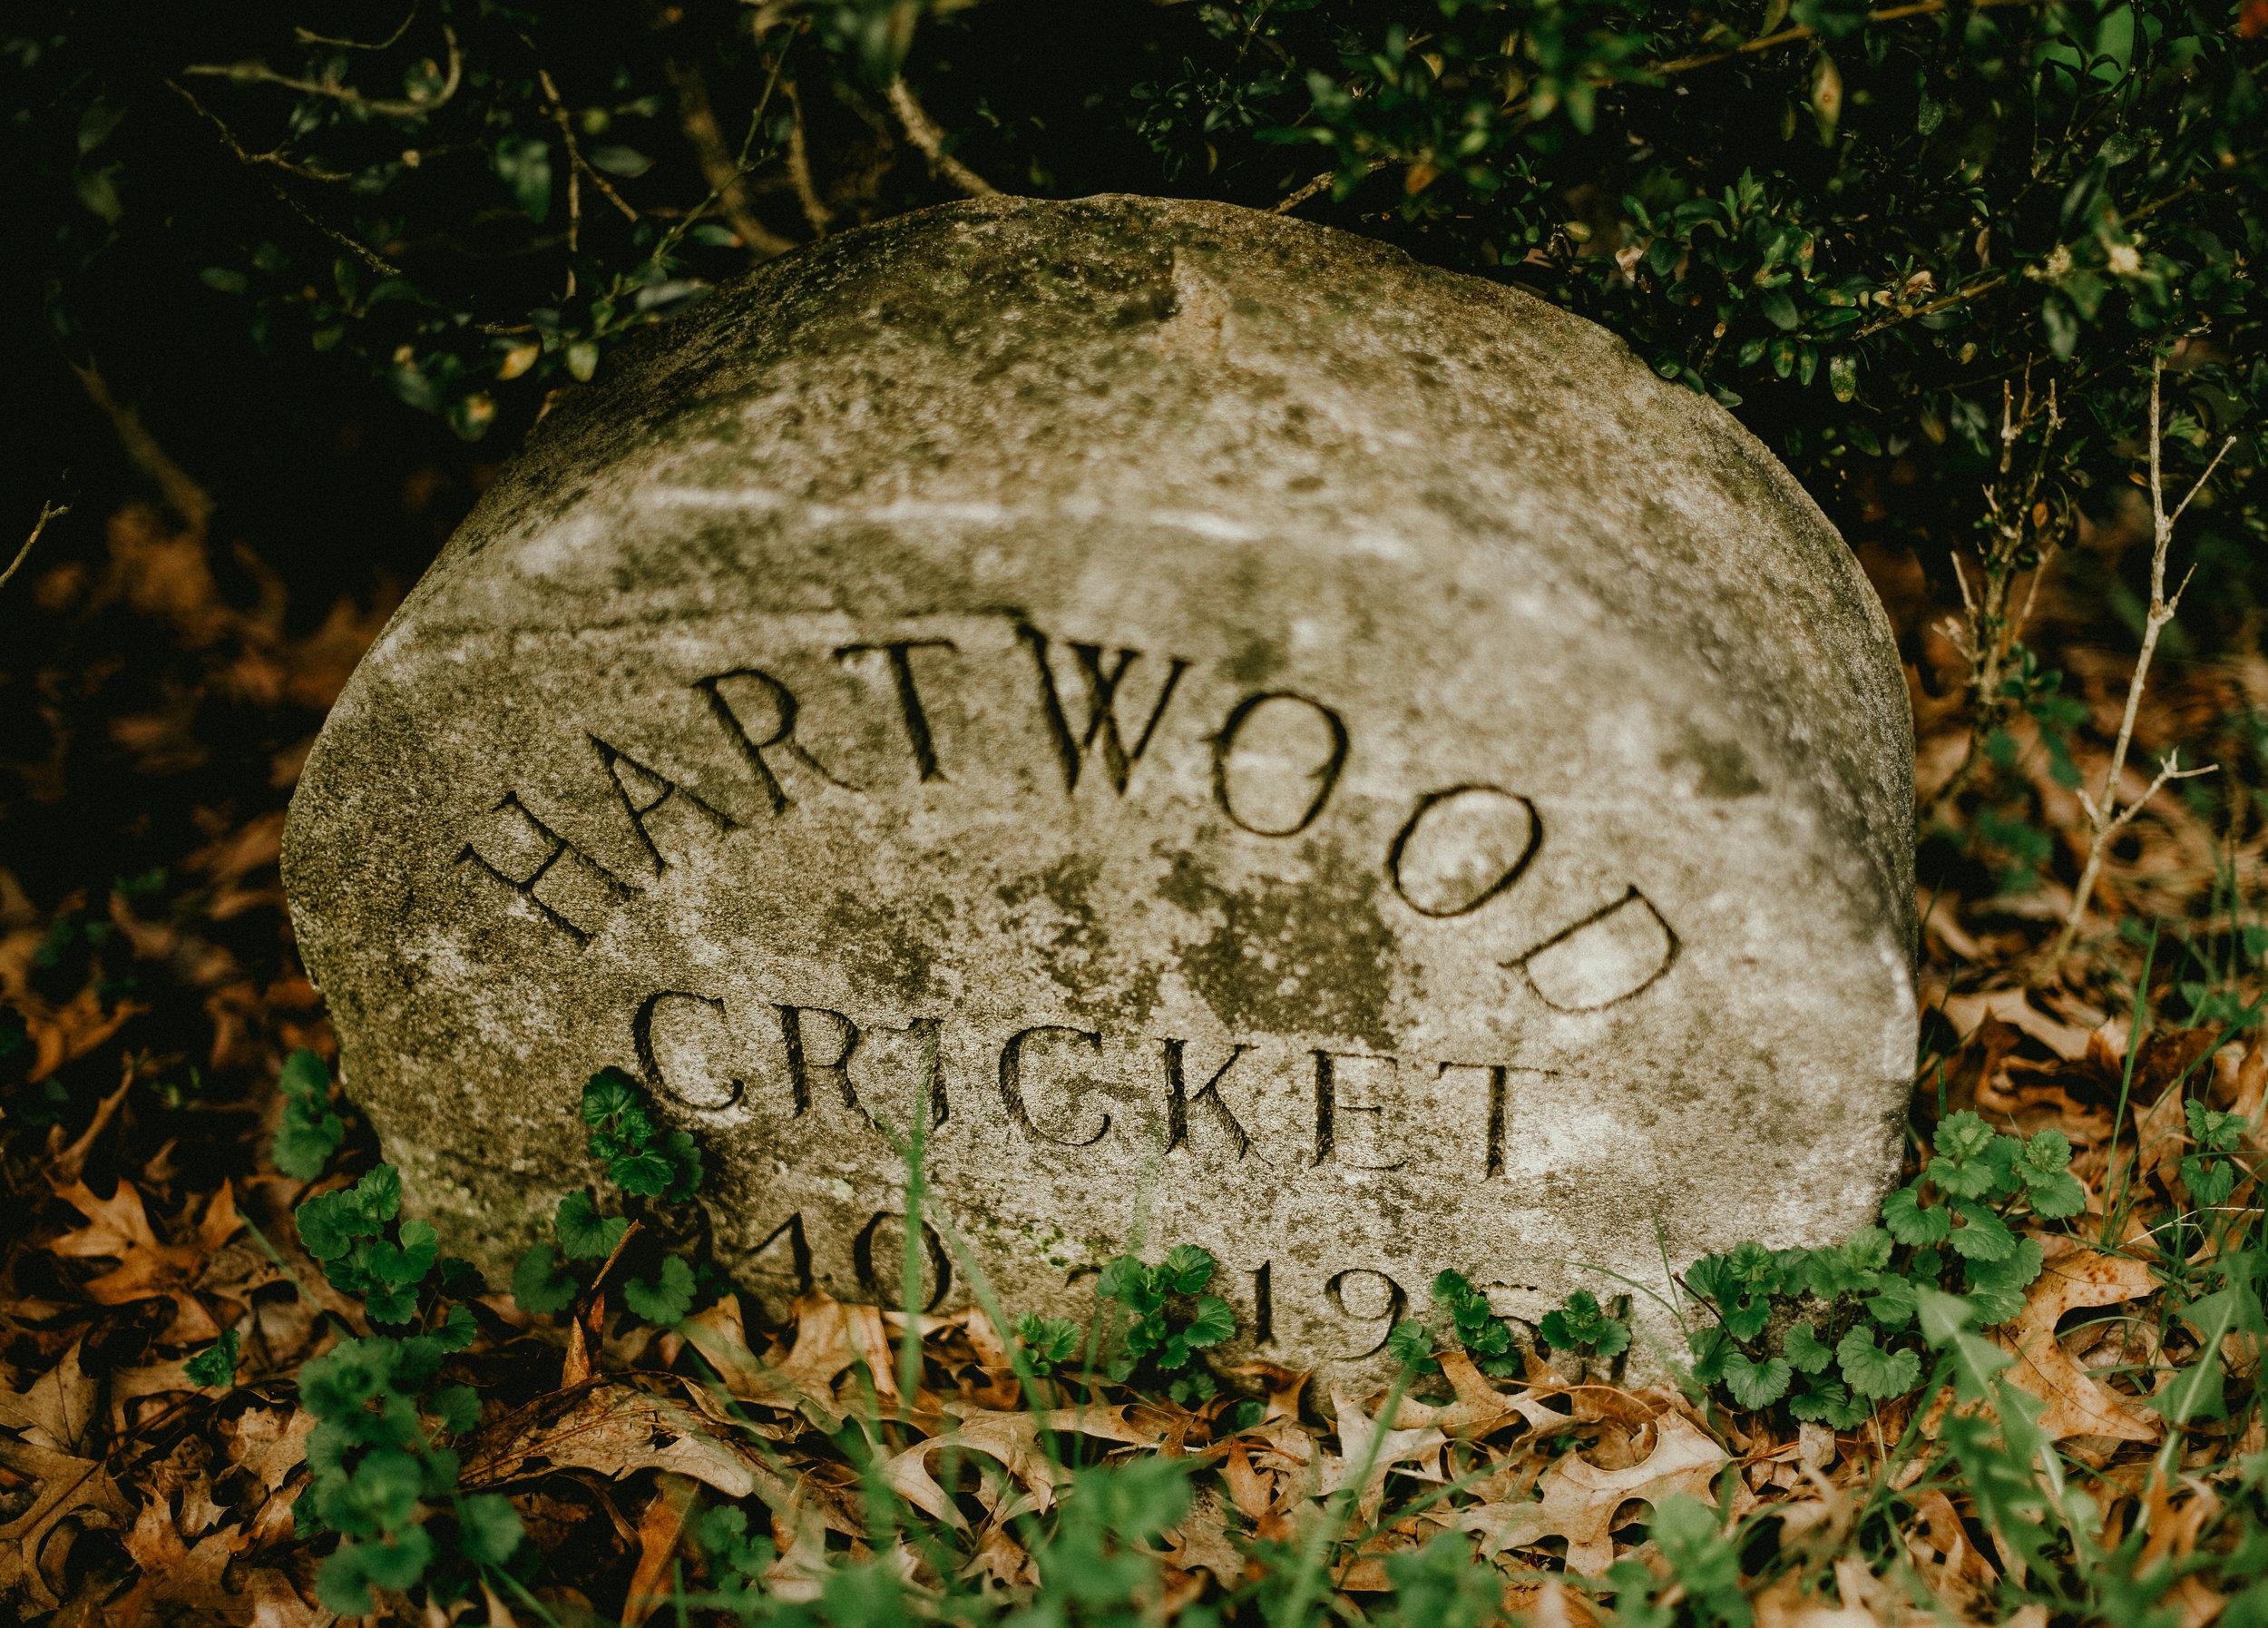 kw-hartwood-pet-cemetery-img1.jpg